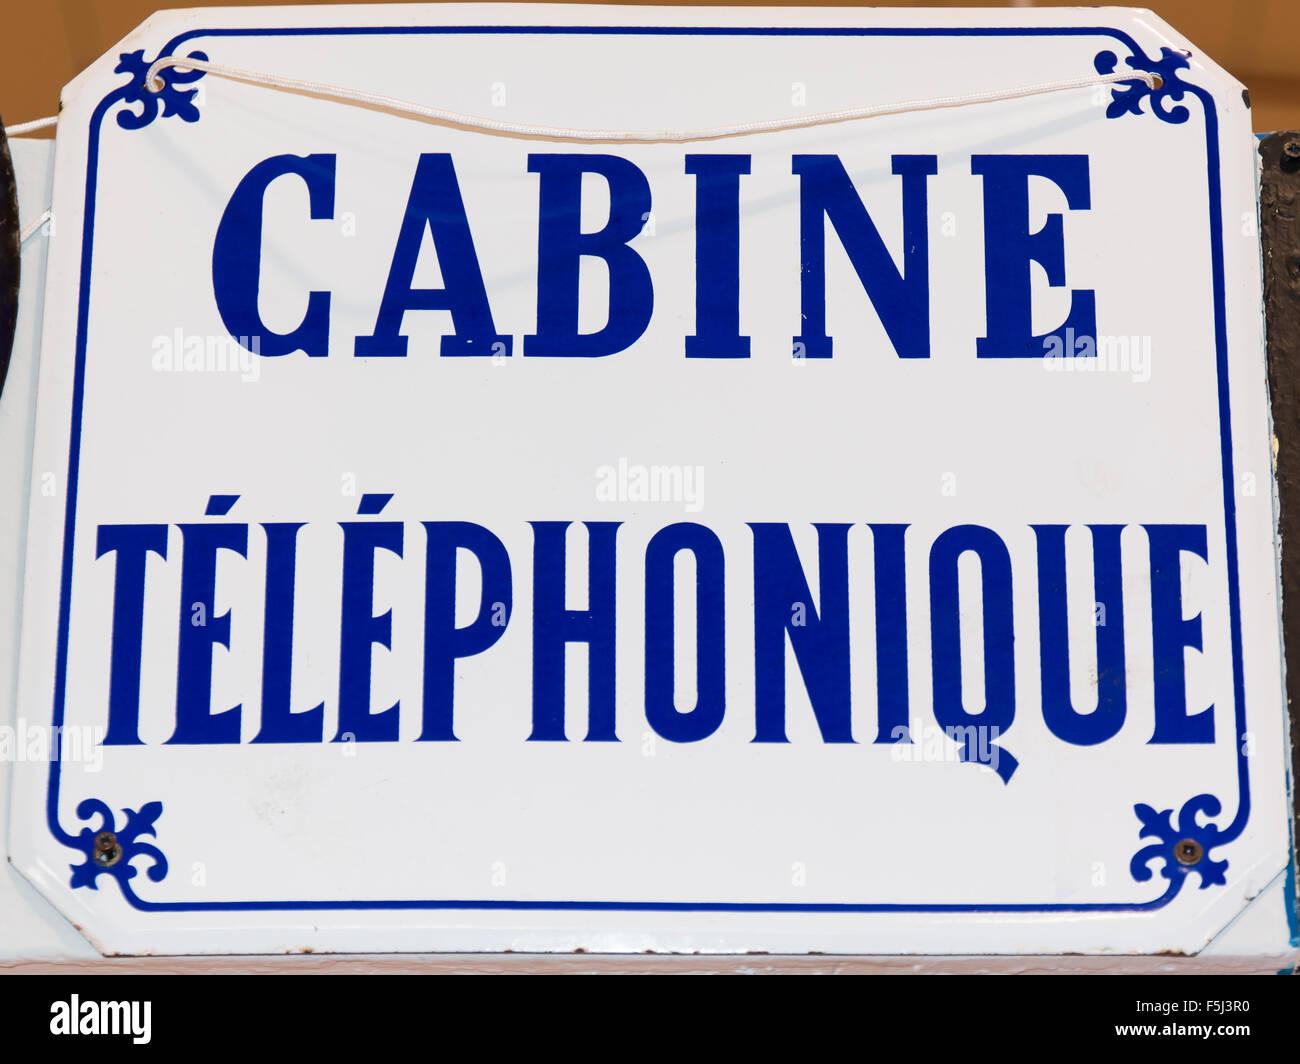 Vintage call box sign - Stock Image